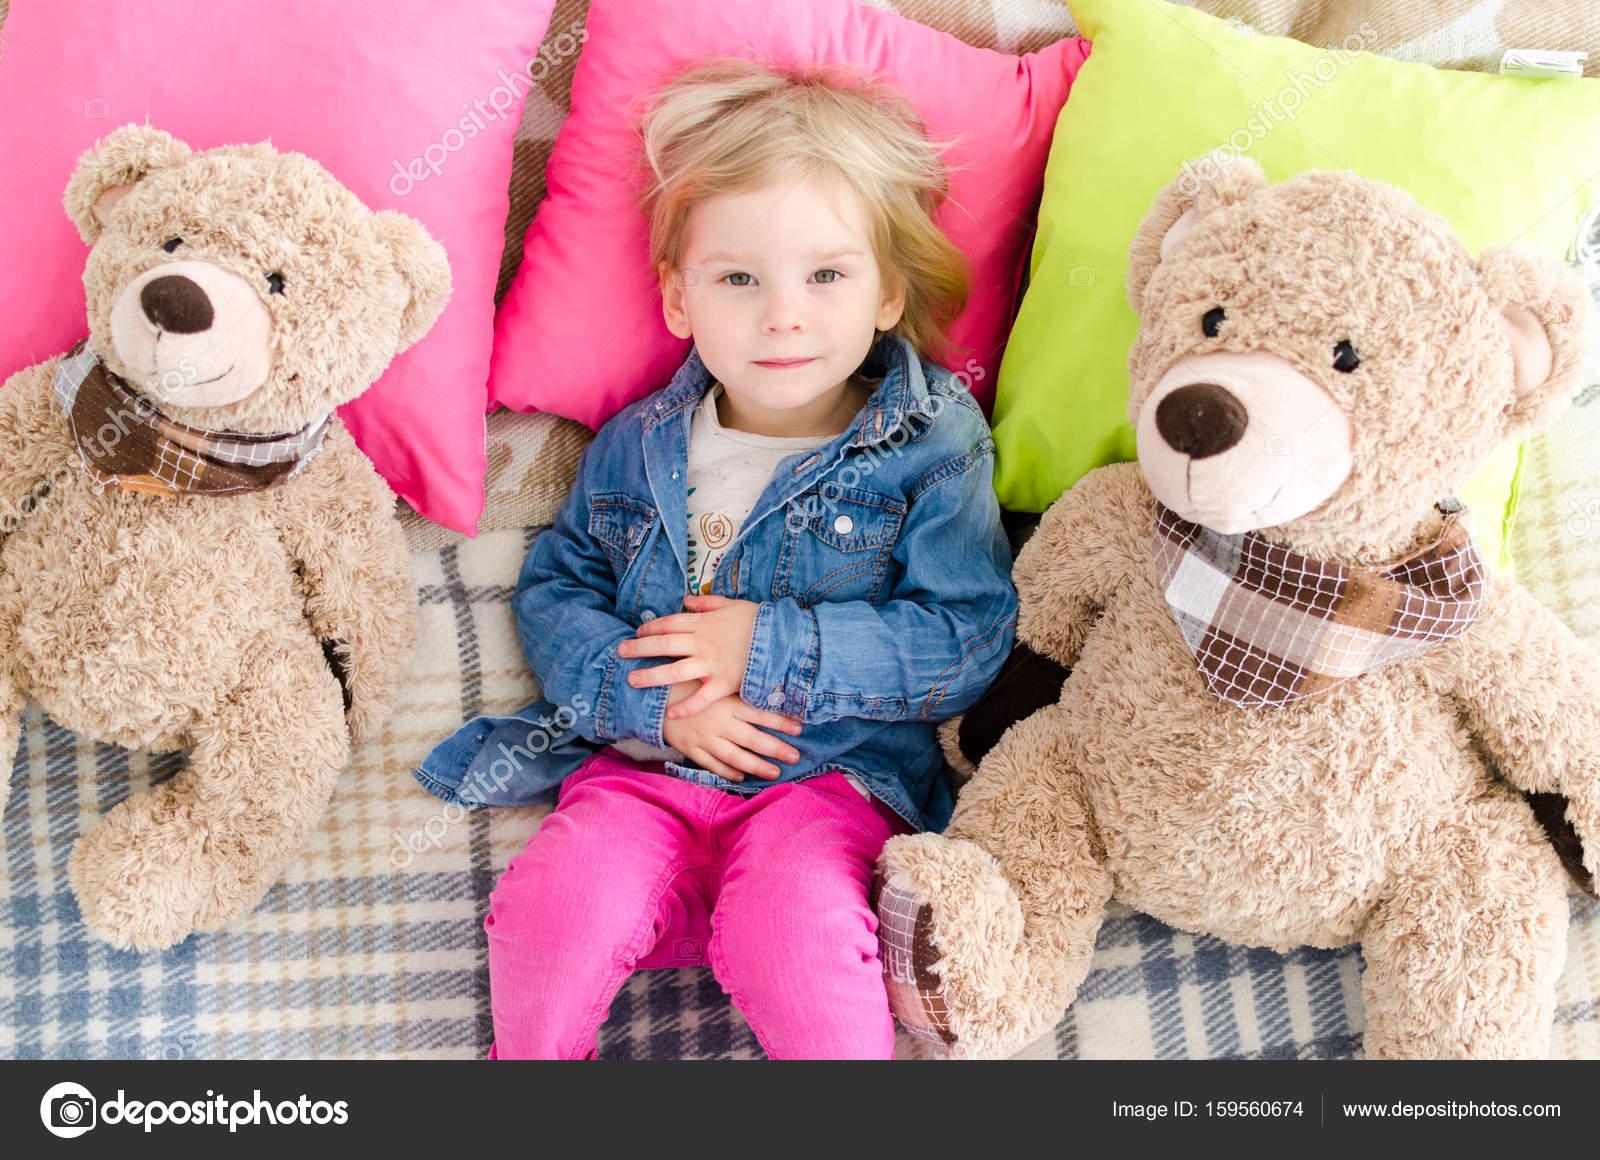 8605c0b6ad2e Cute little girl sleeping with teddy bear in bed — Stock Photo ...